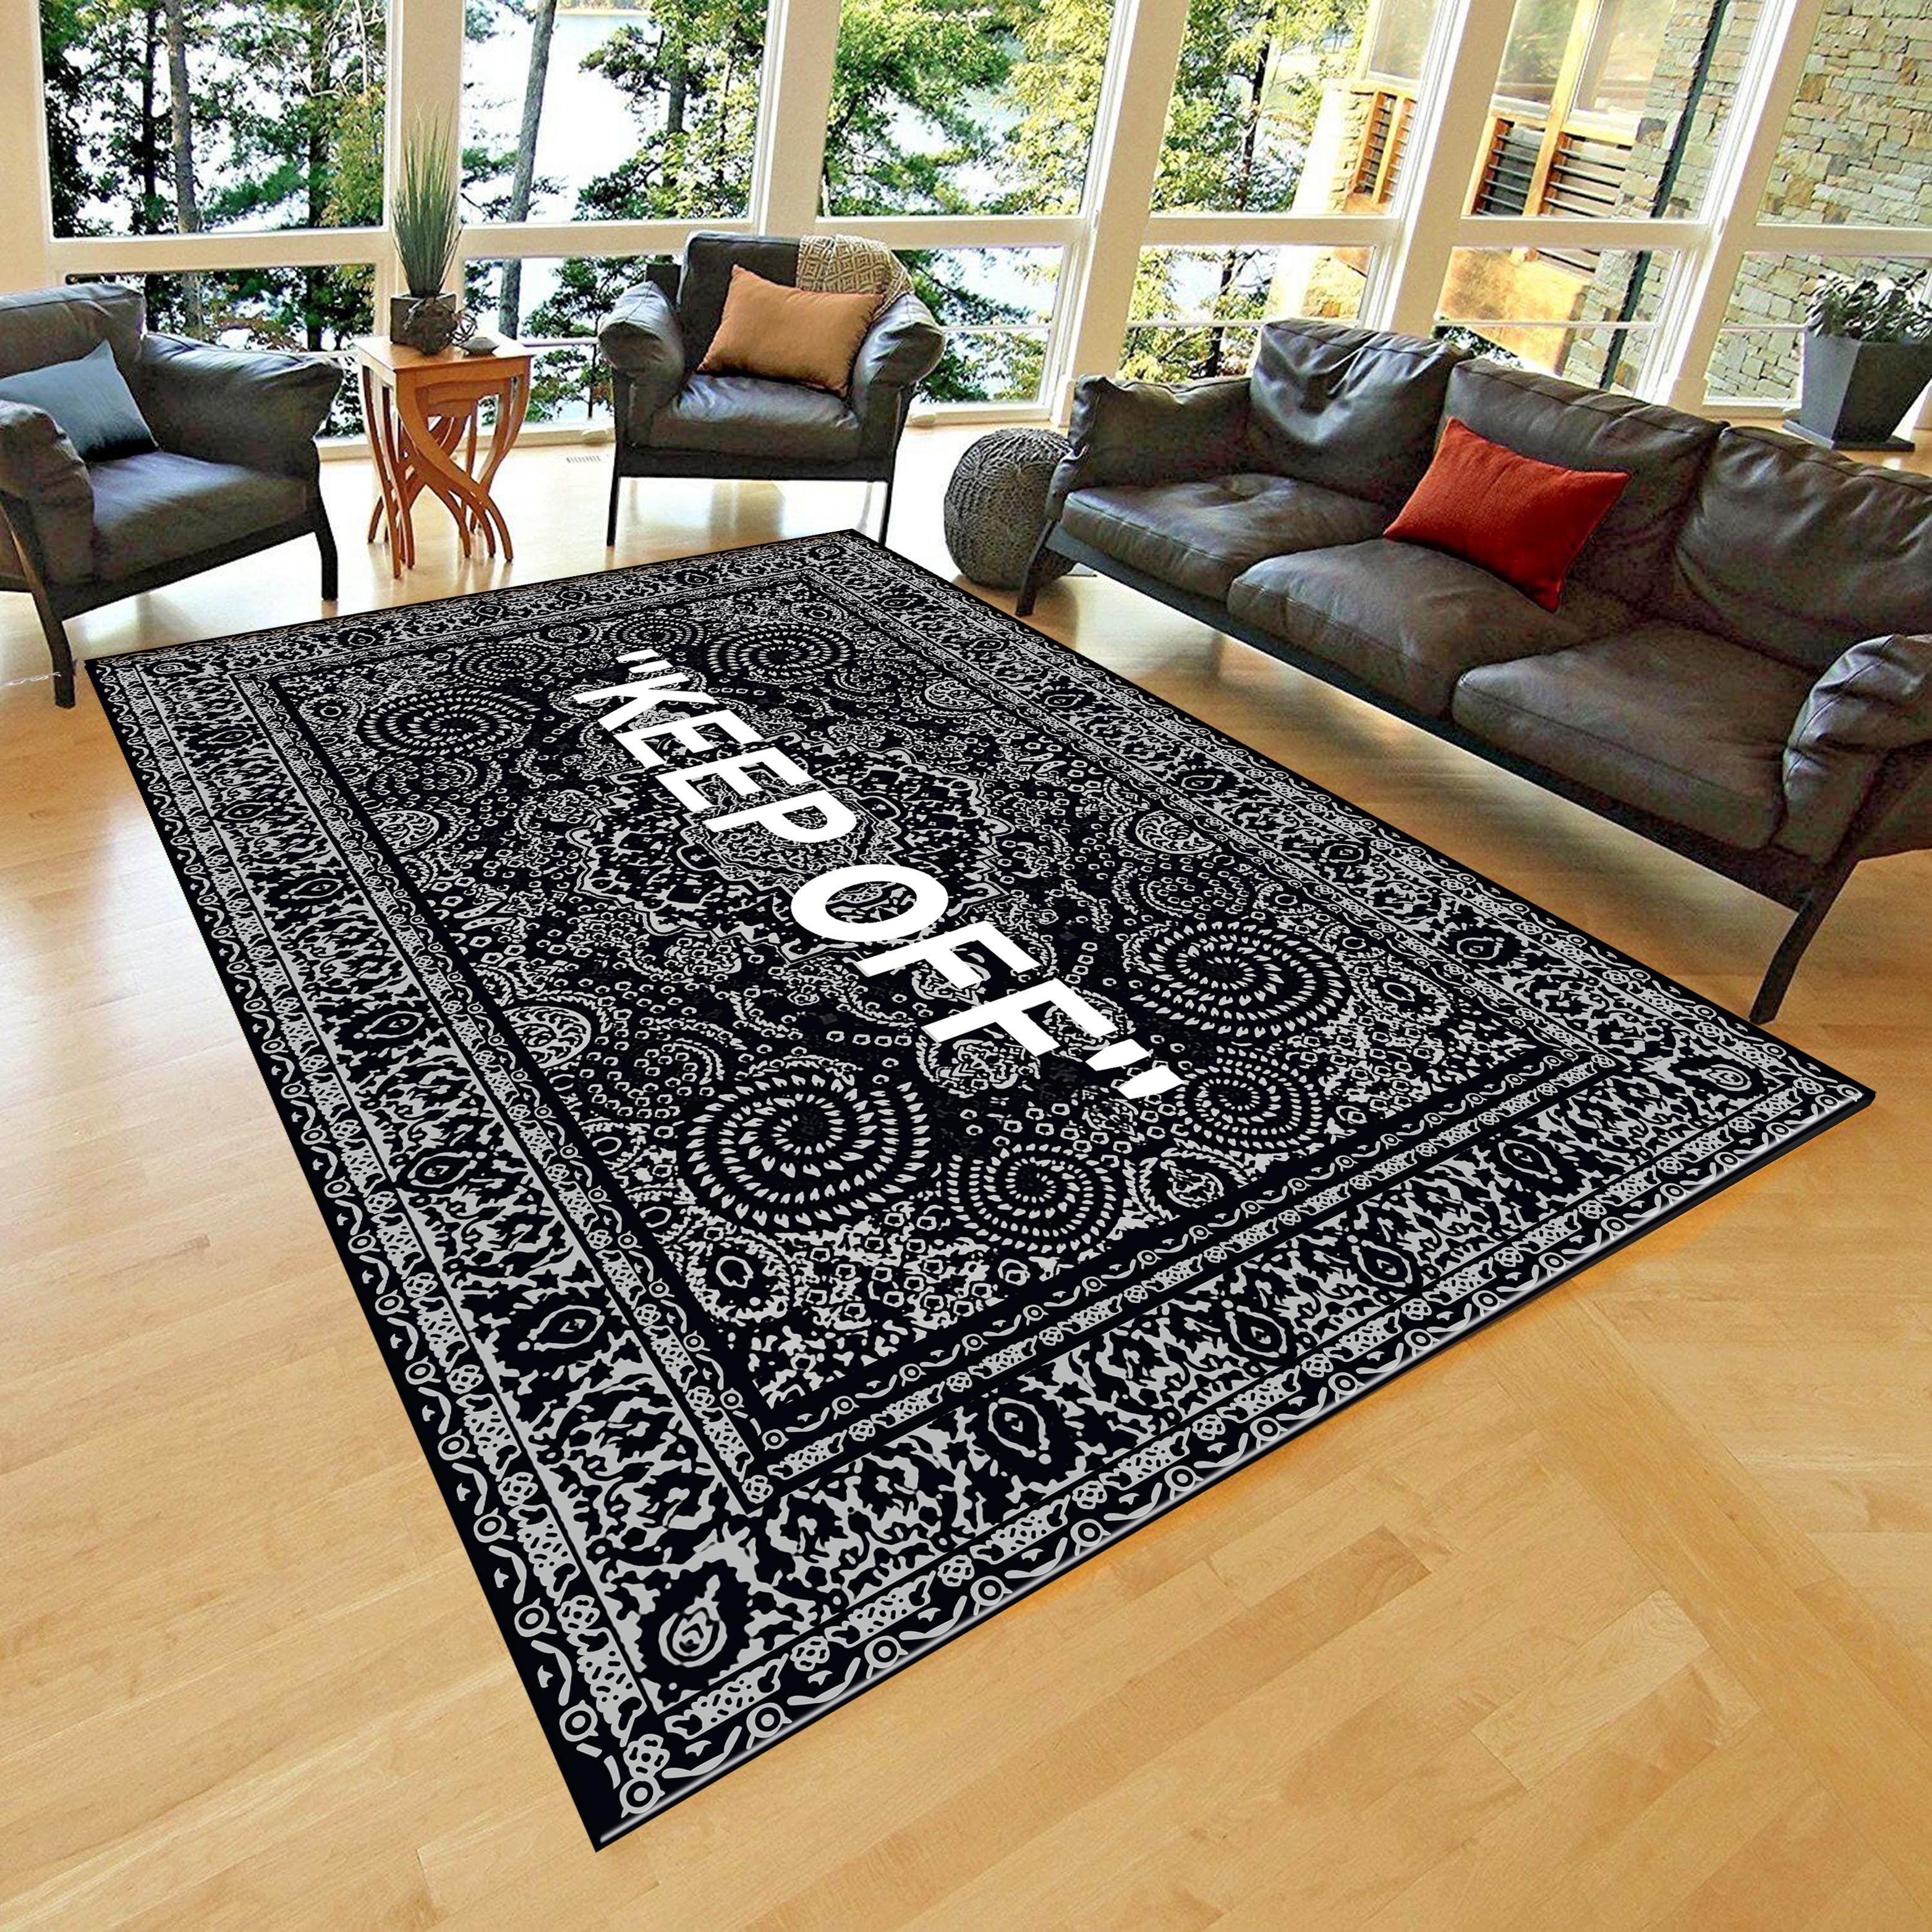 Keep Off Classic Patterned Carpet Fan Carpet Non Slip Floor Carpet Teen S Carpet Area Rug Carpet Aliexpress